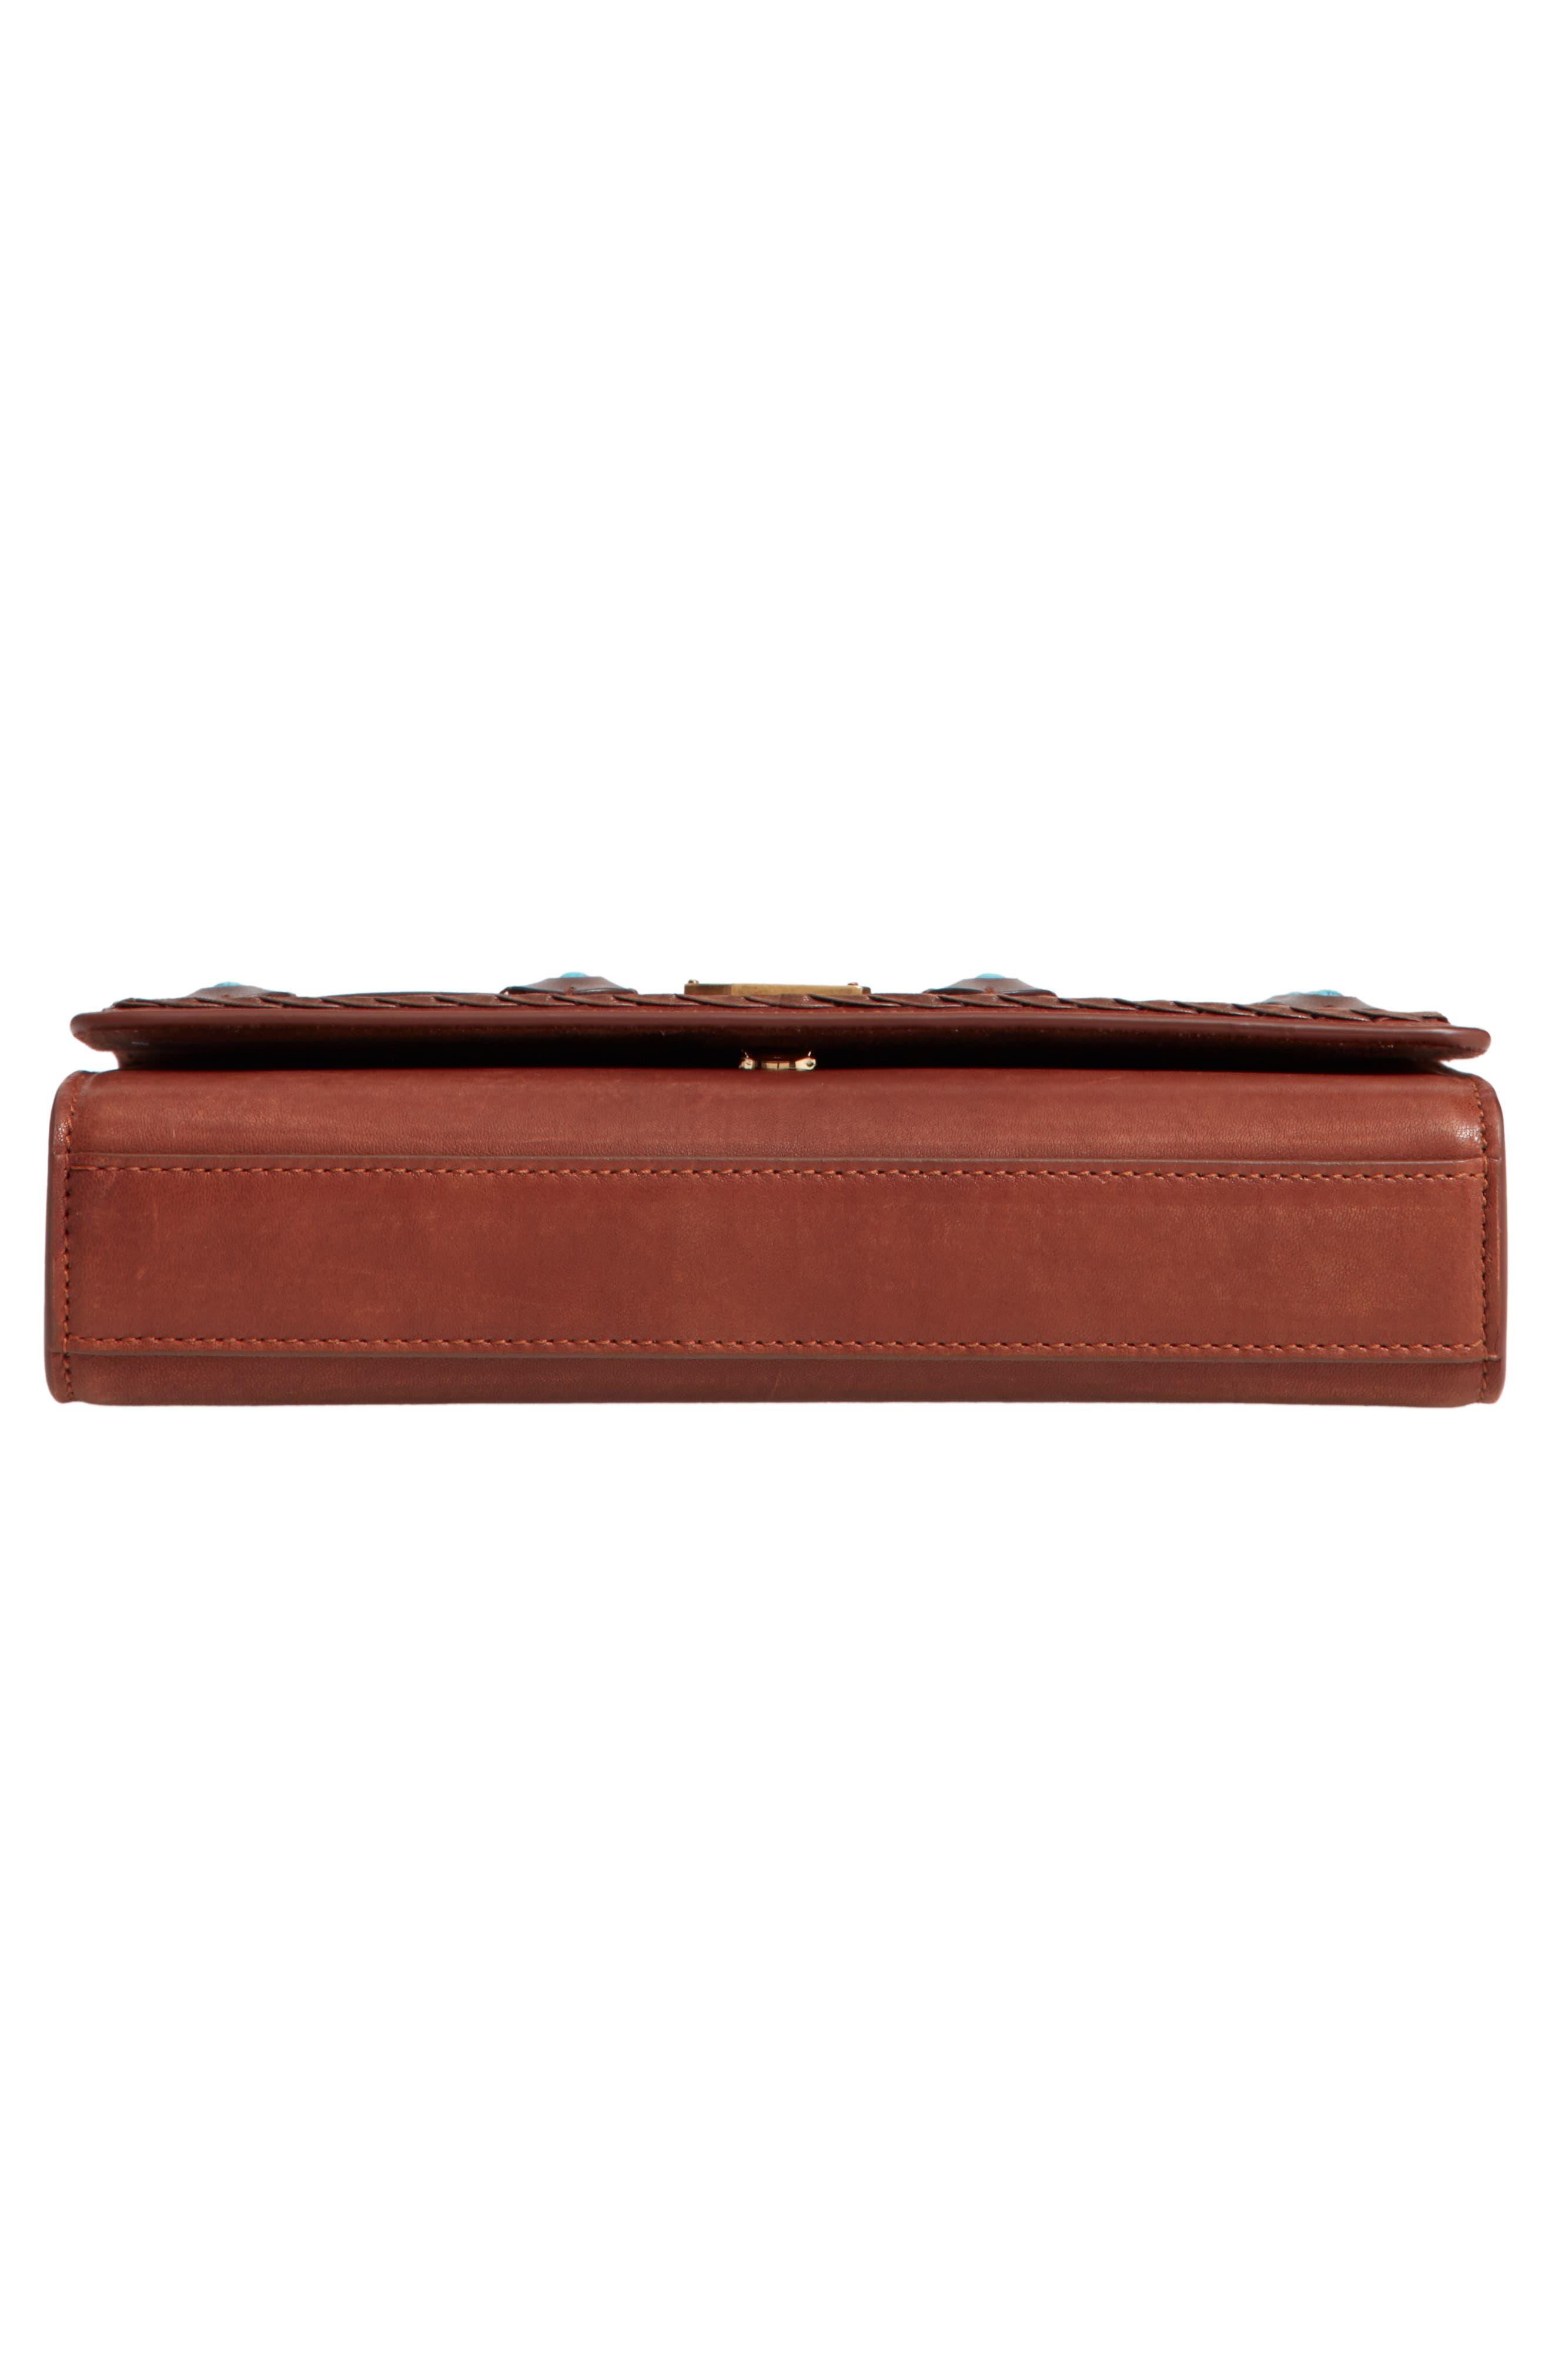 Medium Kate Studded Leather Crossbody Bag,                             Alternate thumbnail 6, color,                             BROWN MULTI